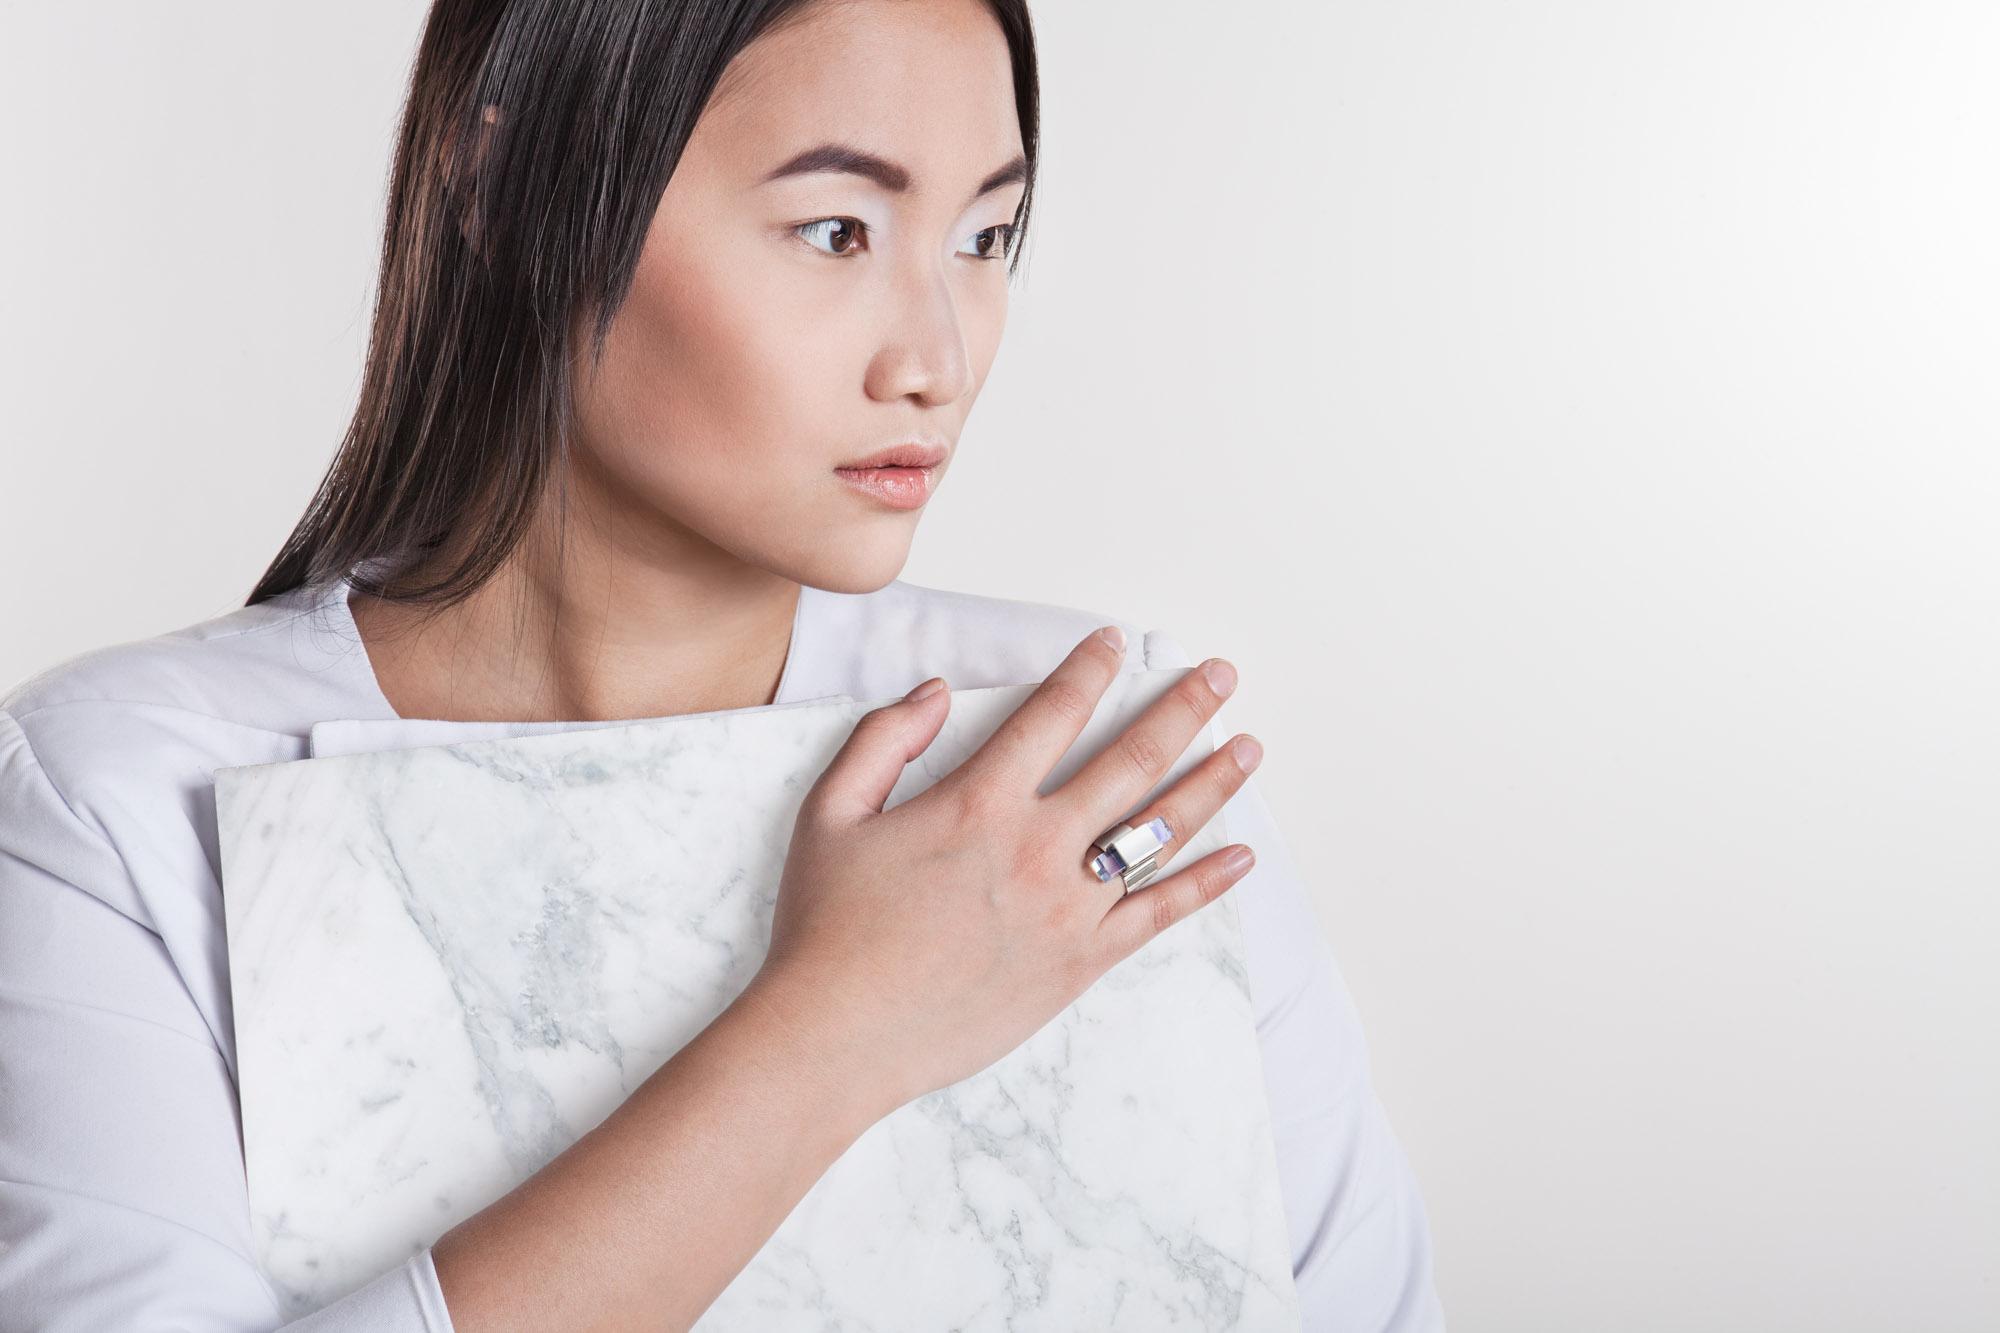 katerina reichova sperky design prsten privesek cesky design moderni ciste